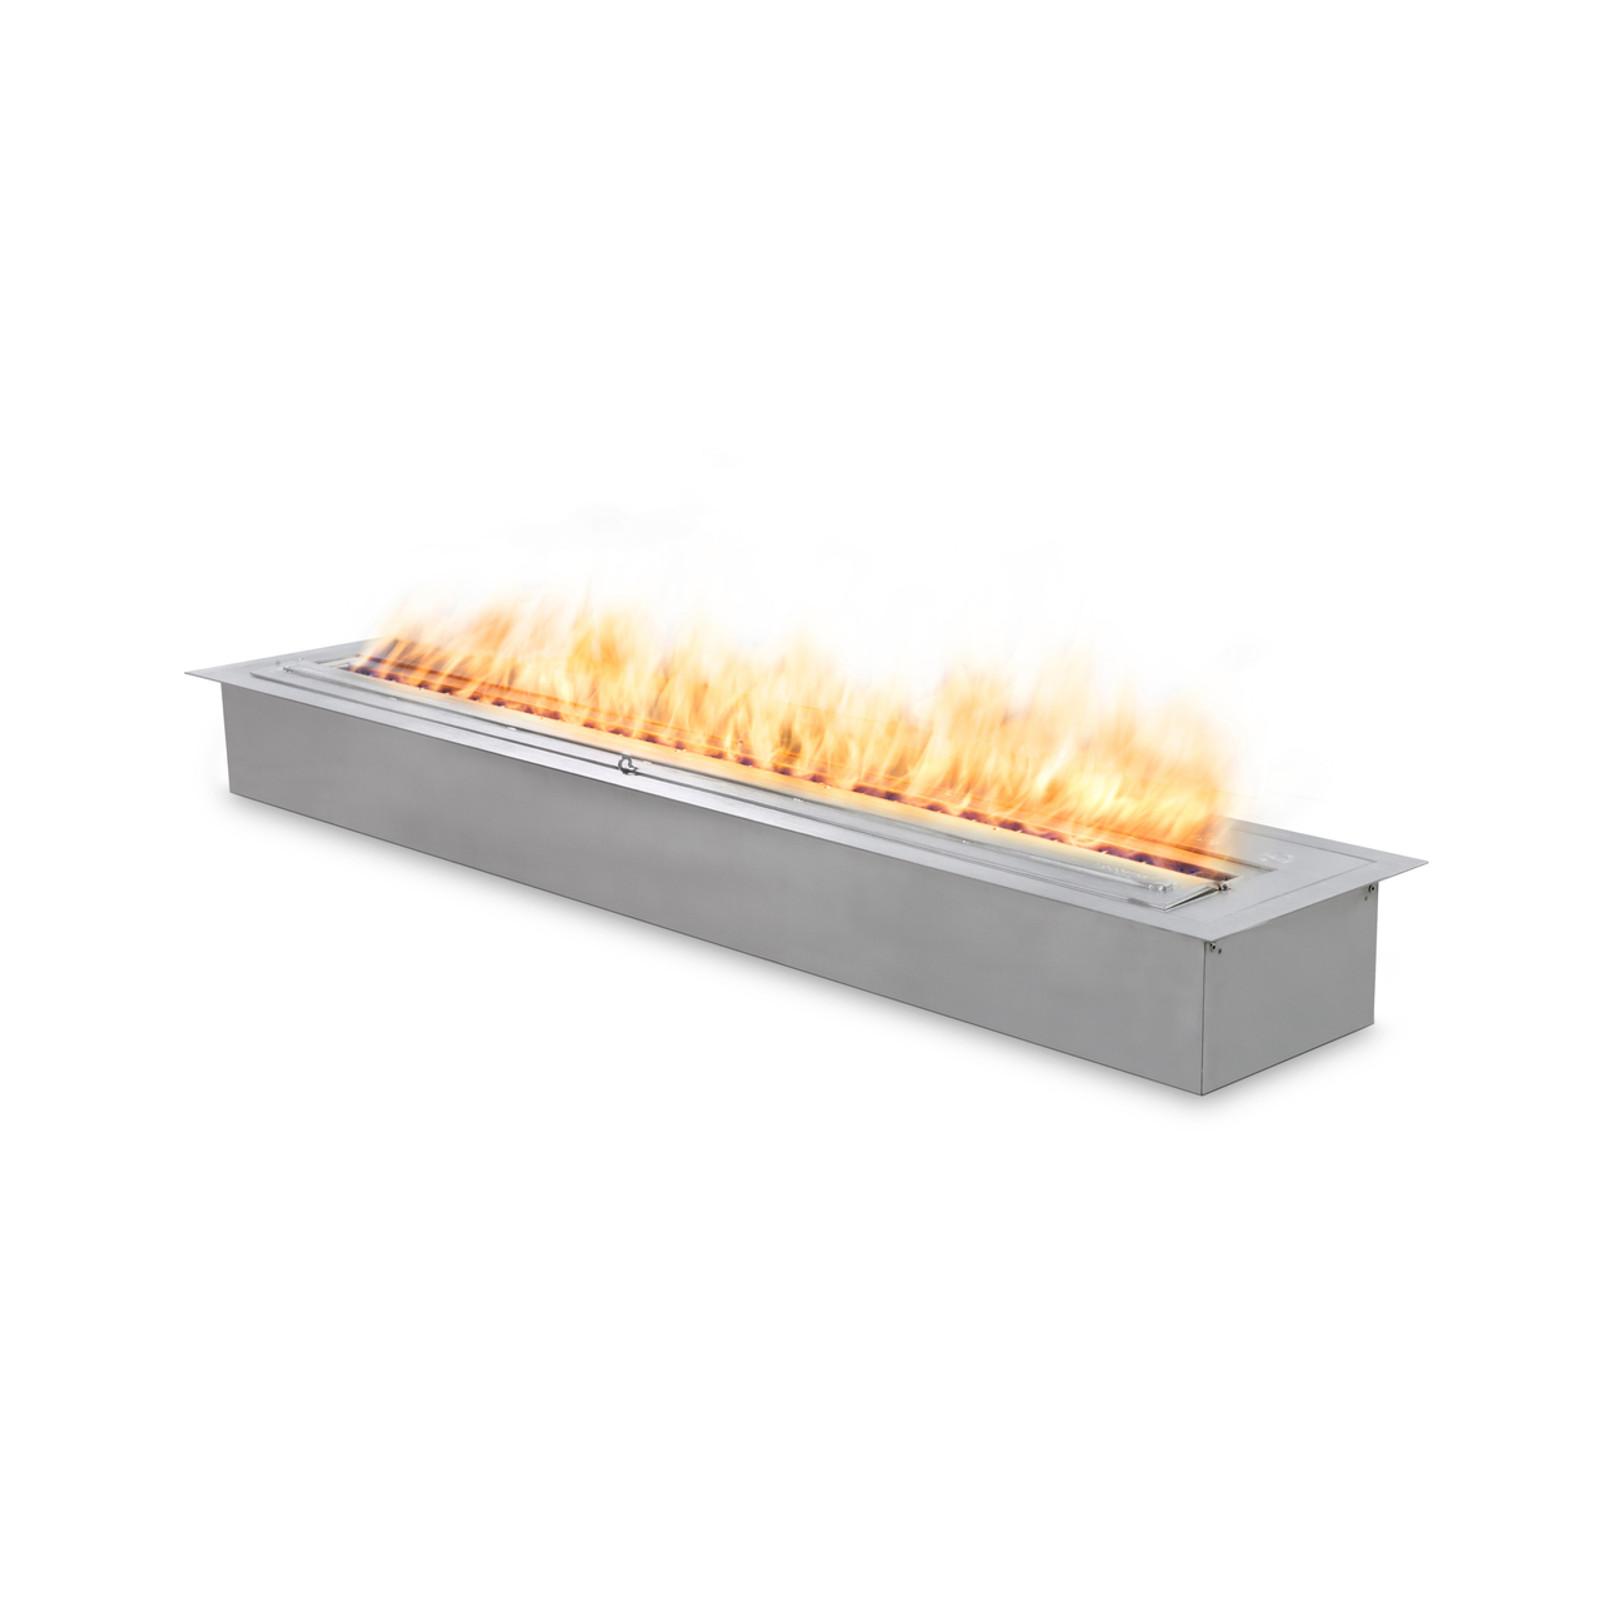 Burner - XL 1200 Stainless Steel - 10 Litres